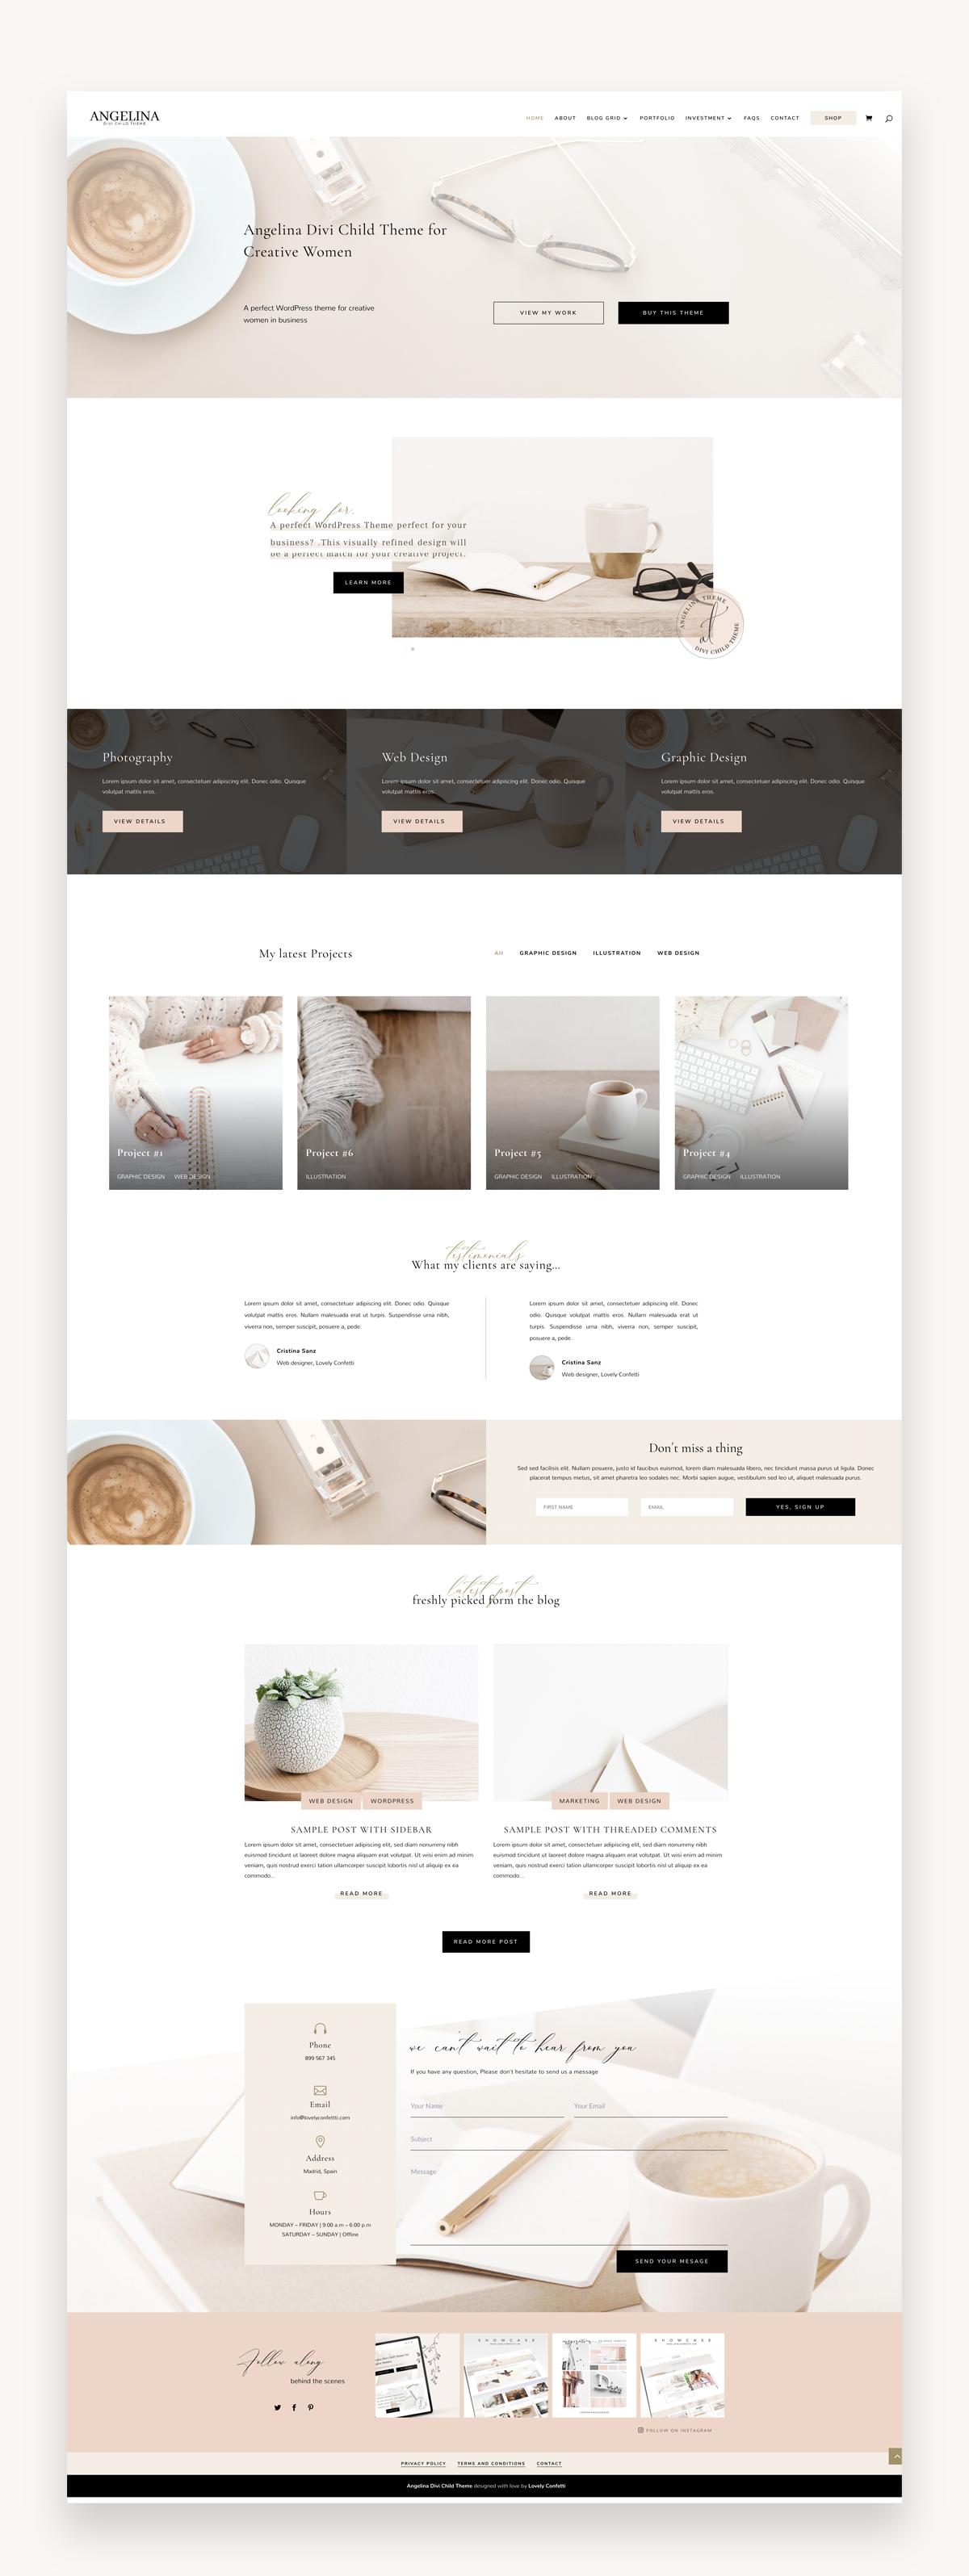 Angelina Divi Child Theme Market Wp Themes Wordpress Theme Design Feminine Wordpress Theme Web Design Inspiration